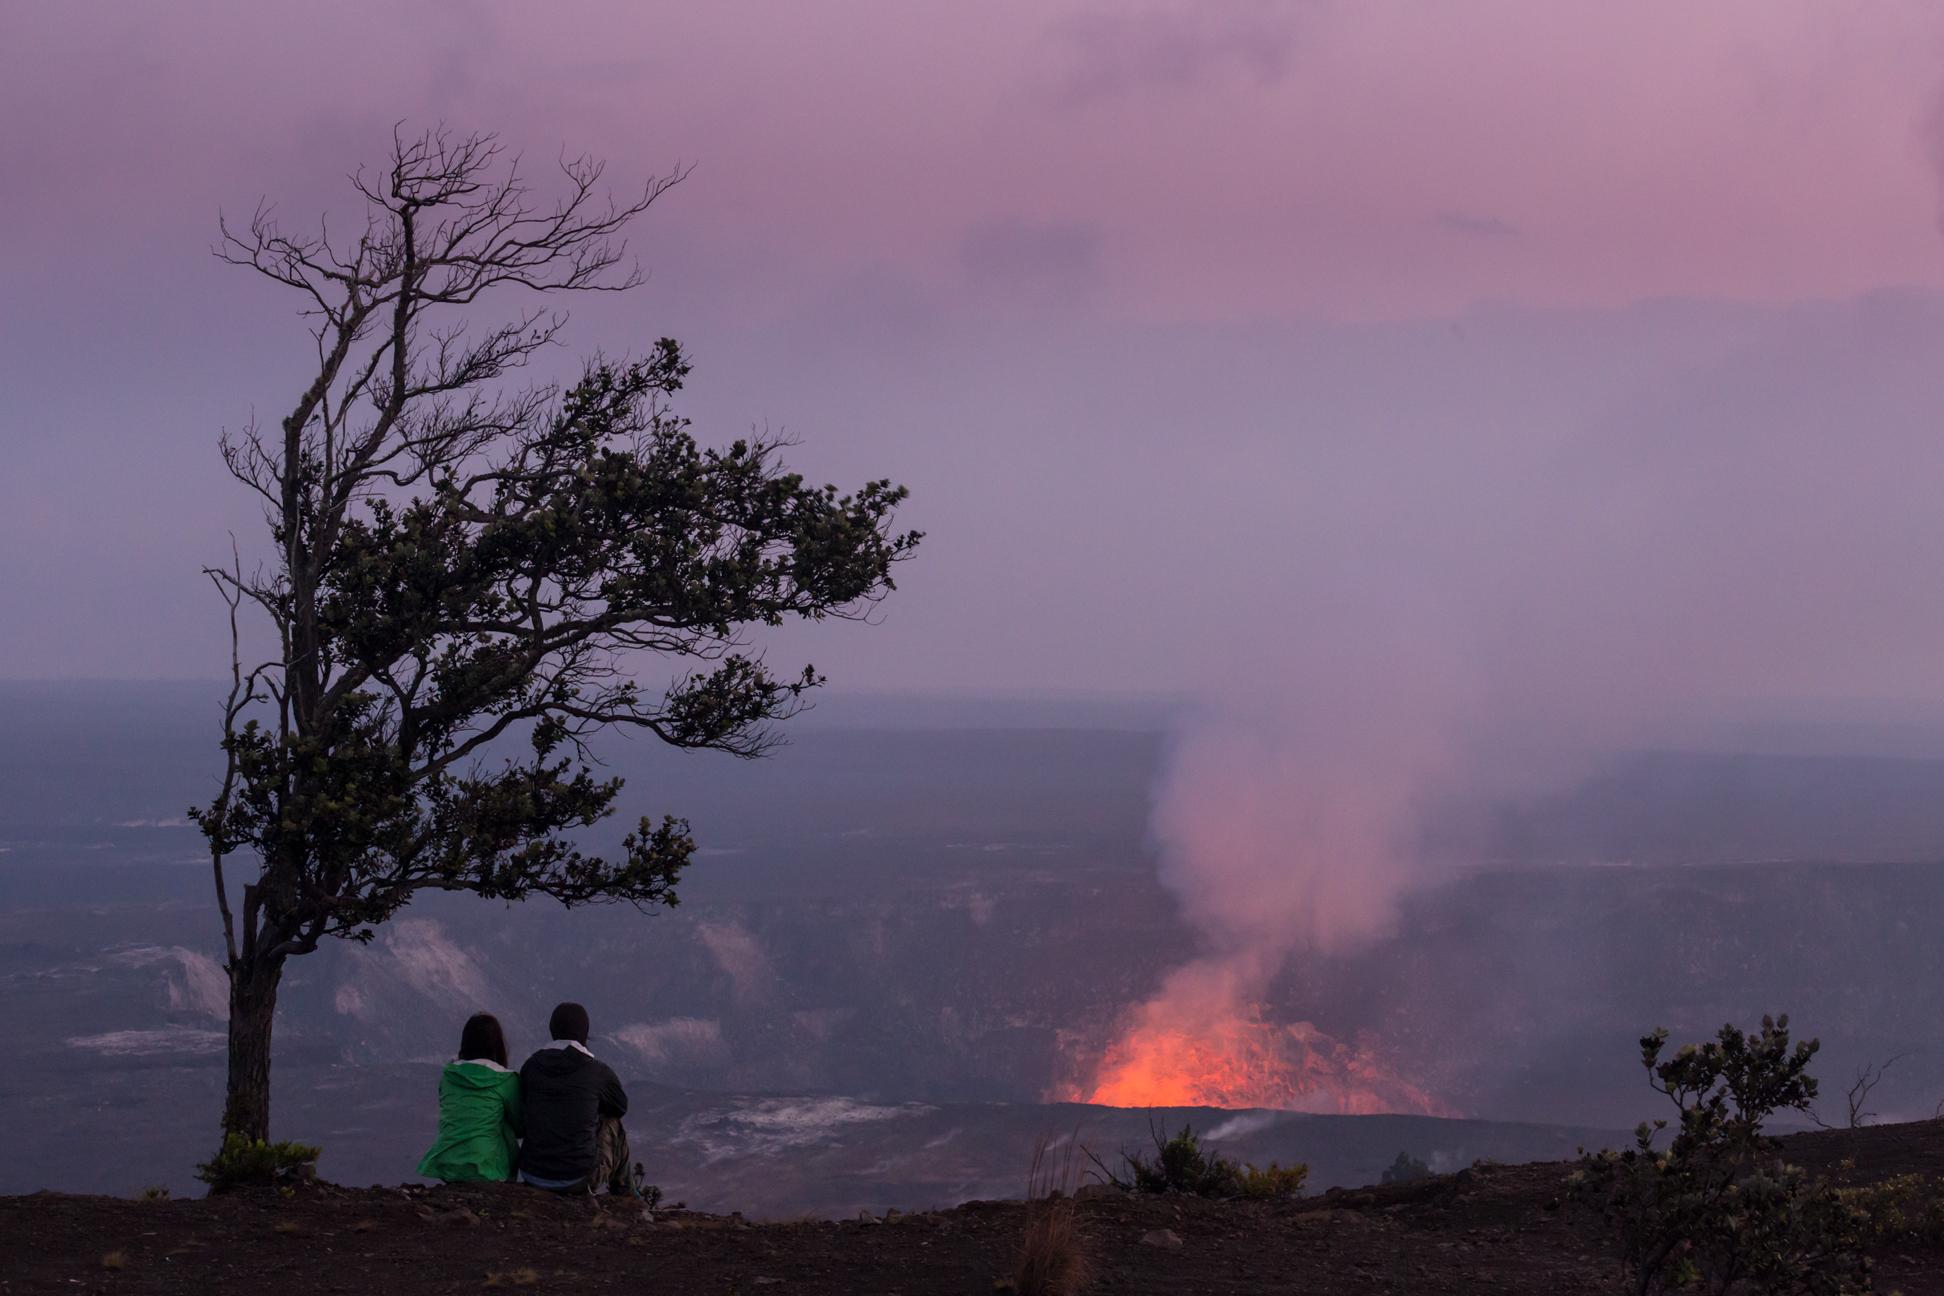 honeymooners guide hawaii tor johnson kilauea volcano 0218